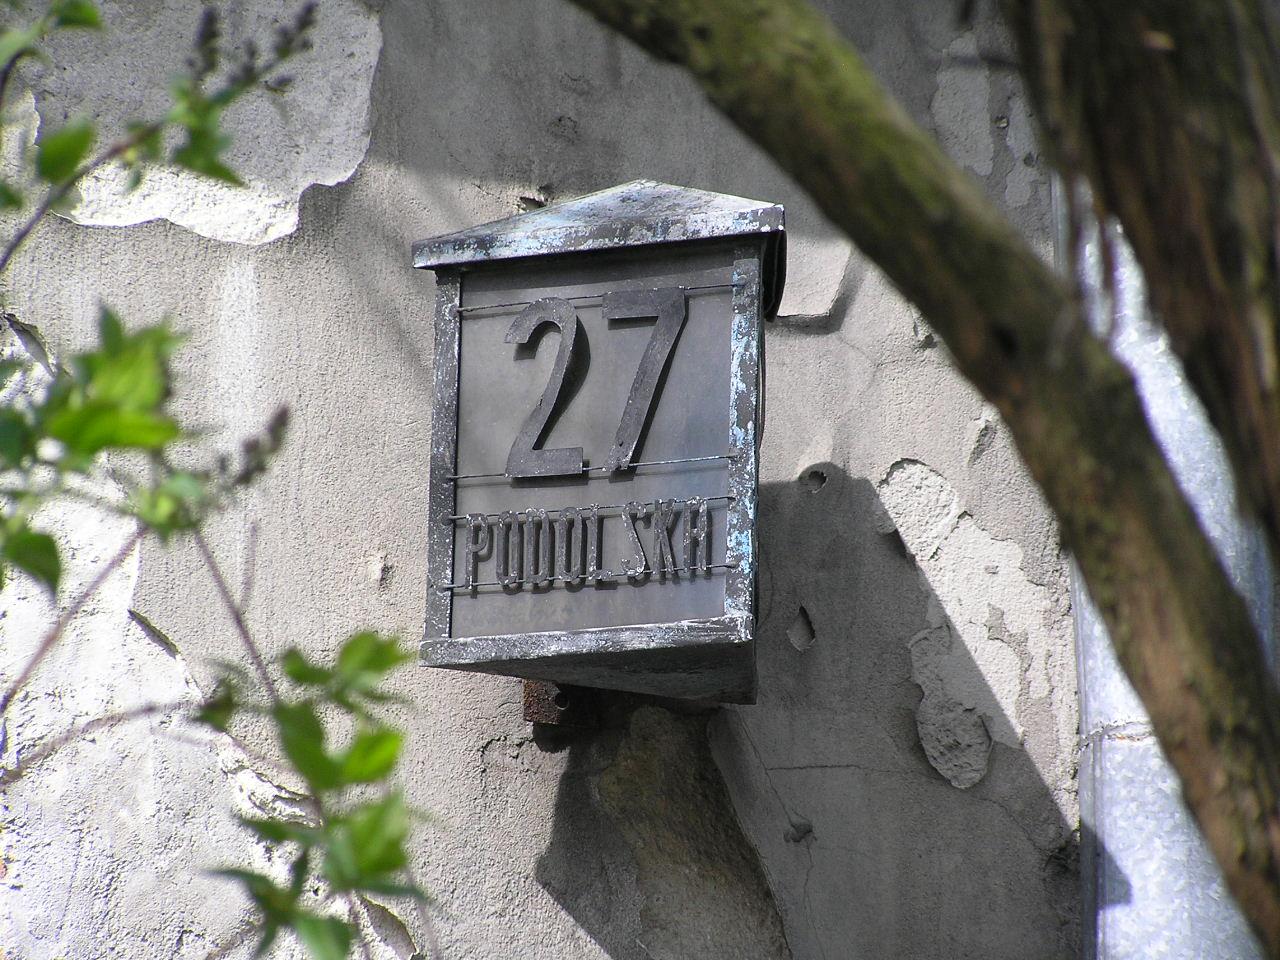 Latarenka adresowa - Podolska 27